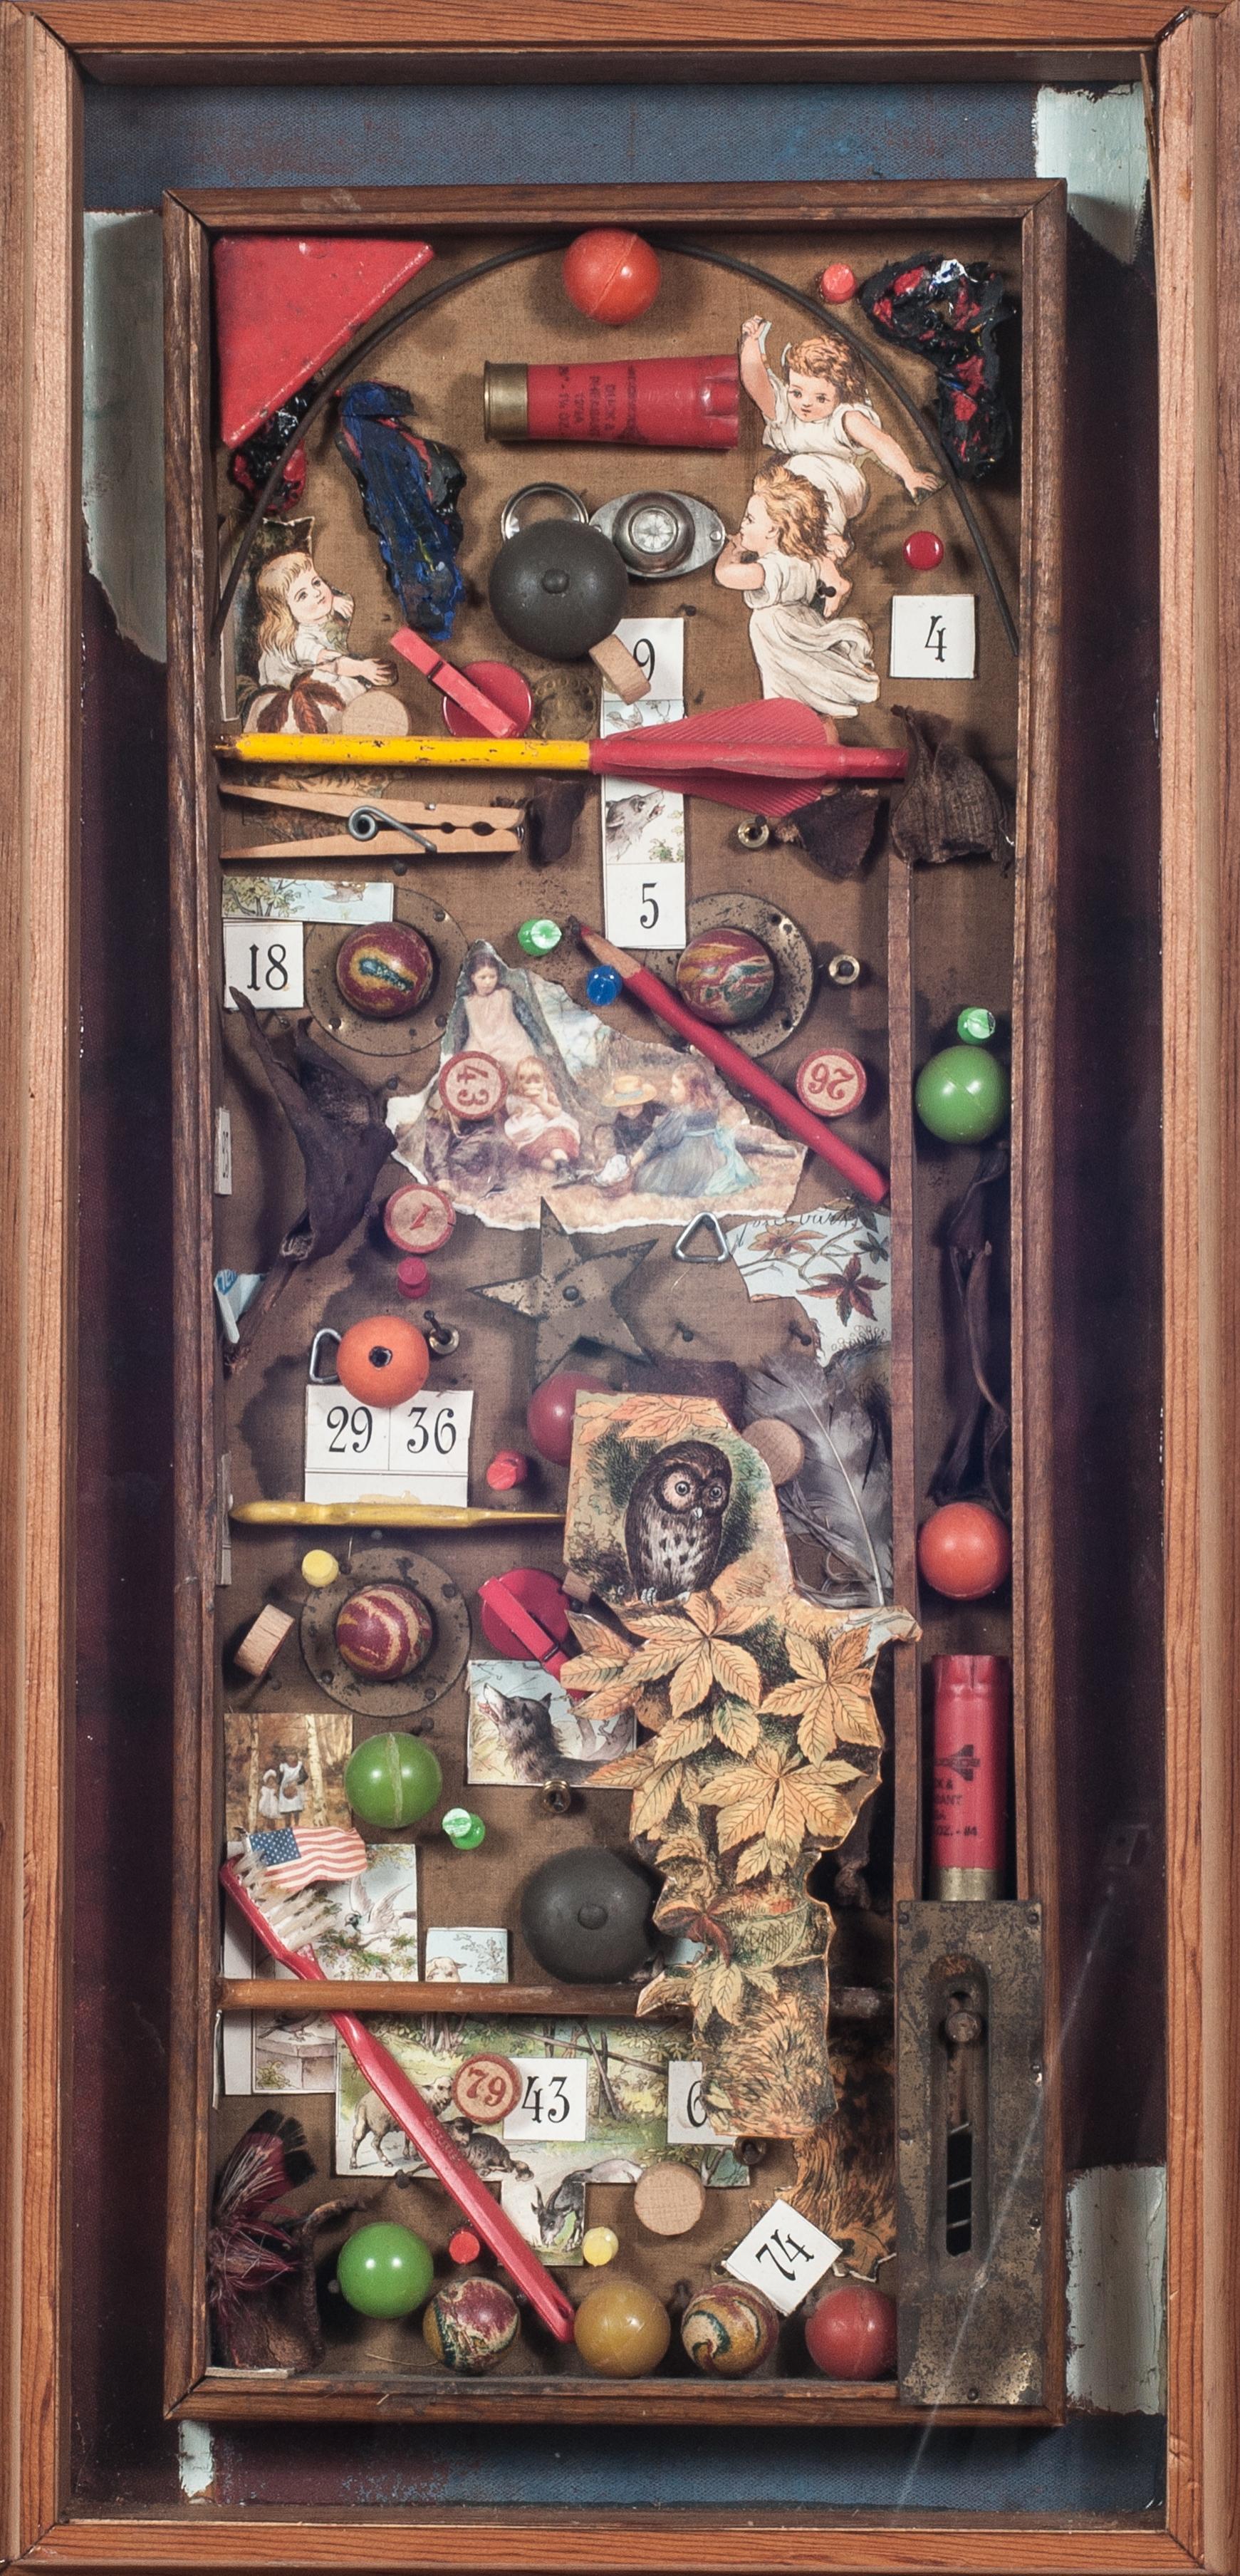 Game Box.    1982, box, 27.6 x 13.4 x 1.8 inches.